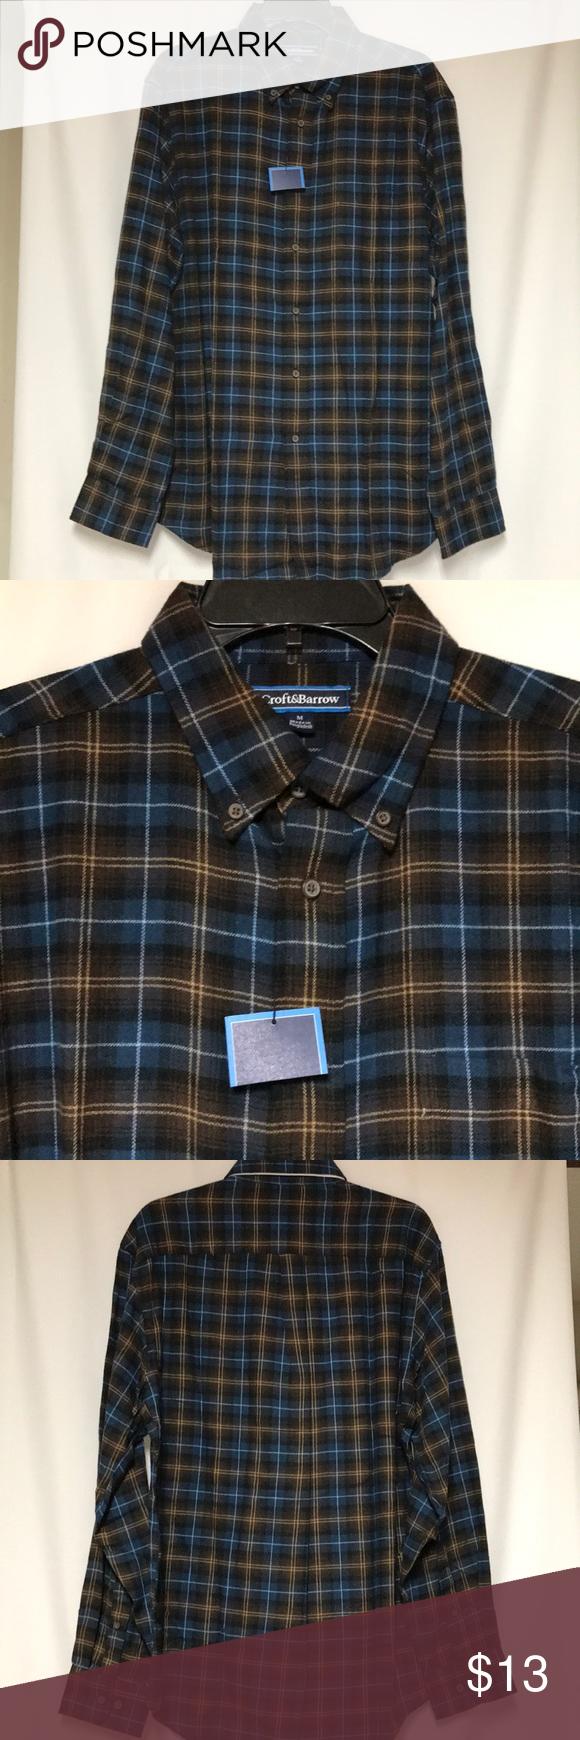 Croft Barrow Men S Plaid Flannel Shirt Size M New Brown Blue